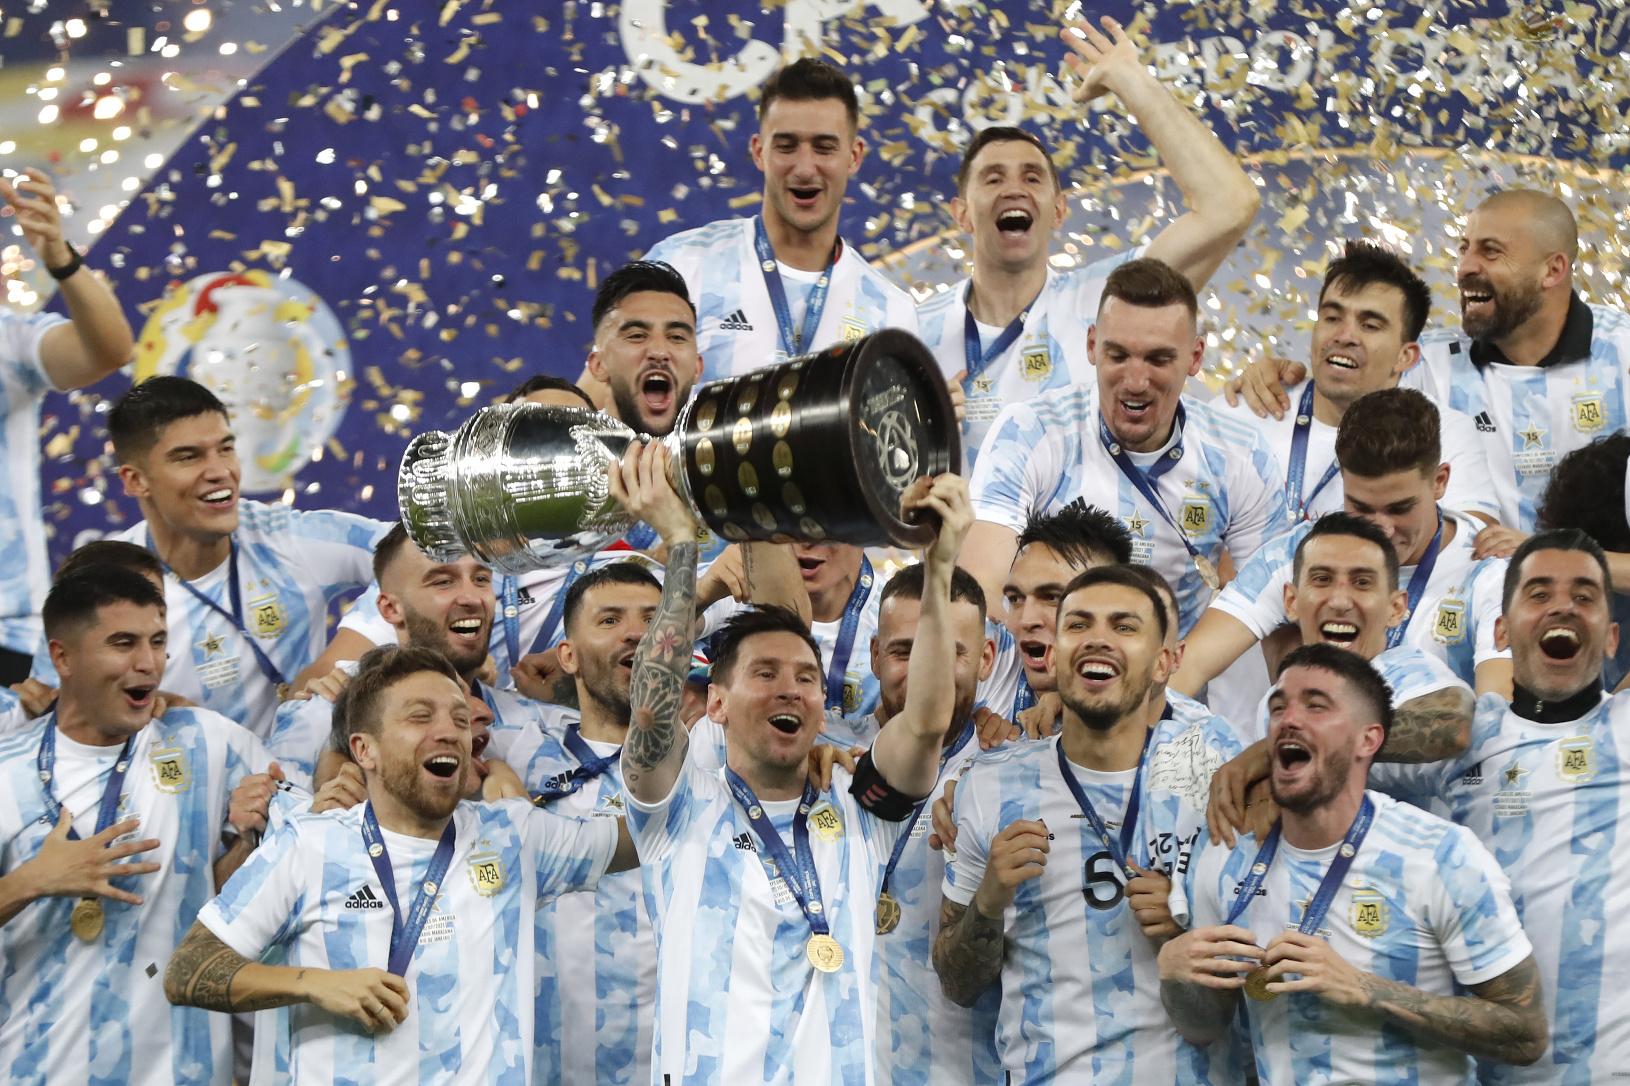 Argentina beats Brazil to Lift Copa America 2021 | 2021 ஆம் ஆண்டின் கோபா அமெரிக்கா வென்று அர்ஜென்டினா பிரேசிலை வீழ்த்தியது |_40.1